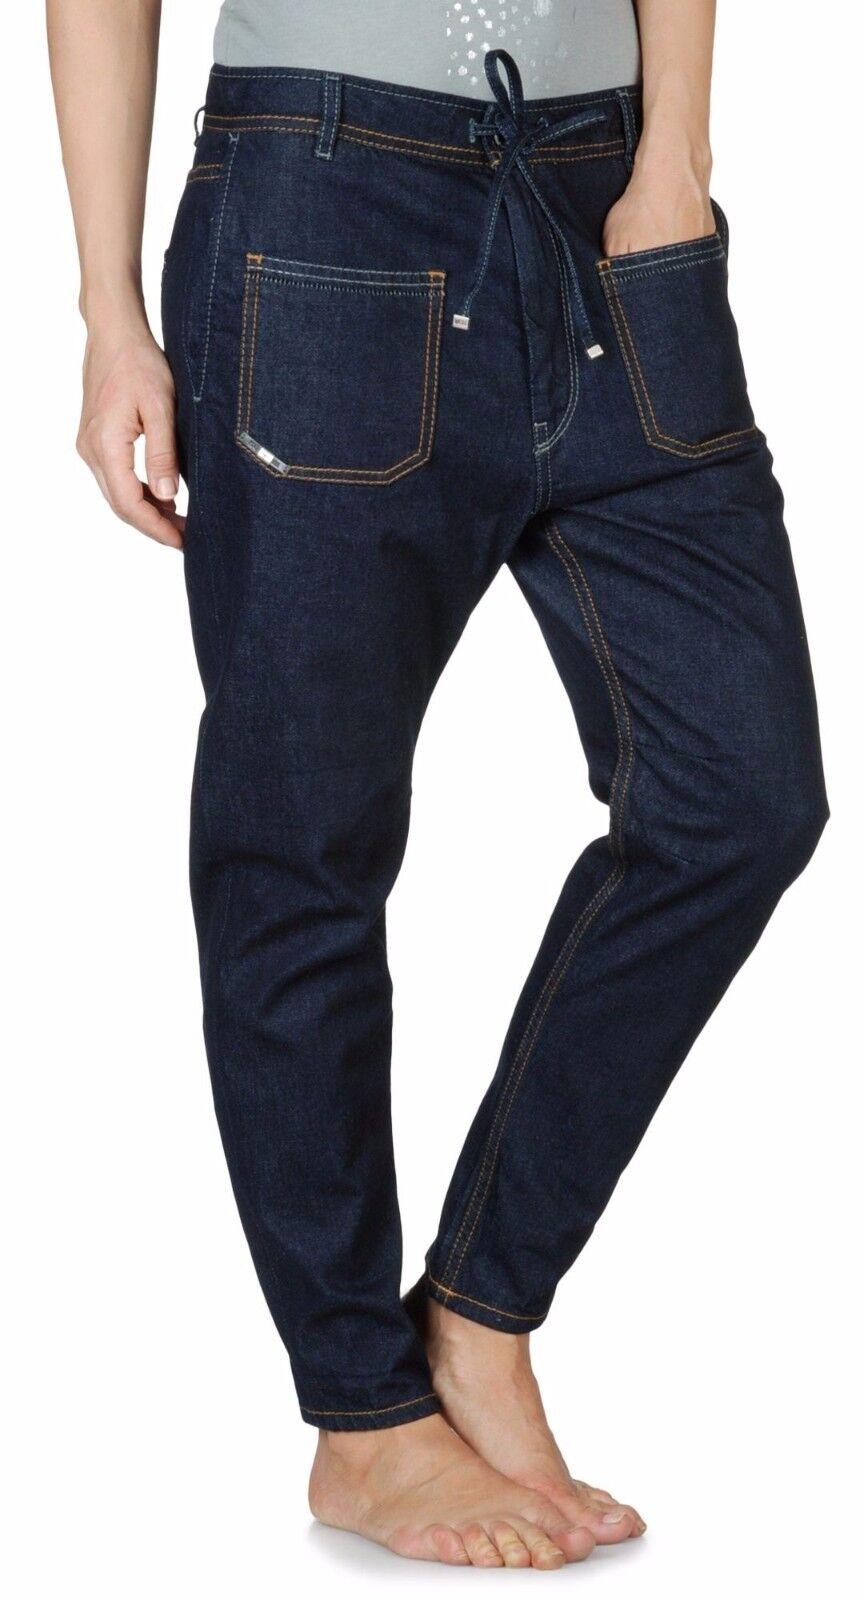 Diesel + Edun Ed Partee Joggings Cotton Jeans Drawstring Dark Indigo 24